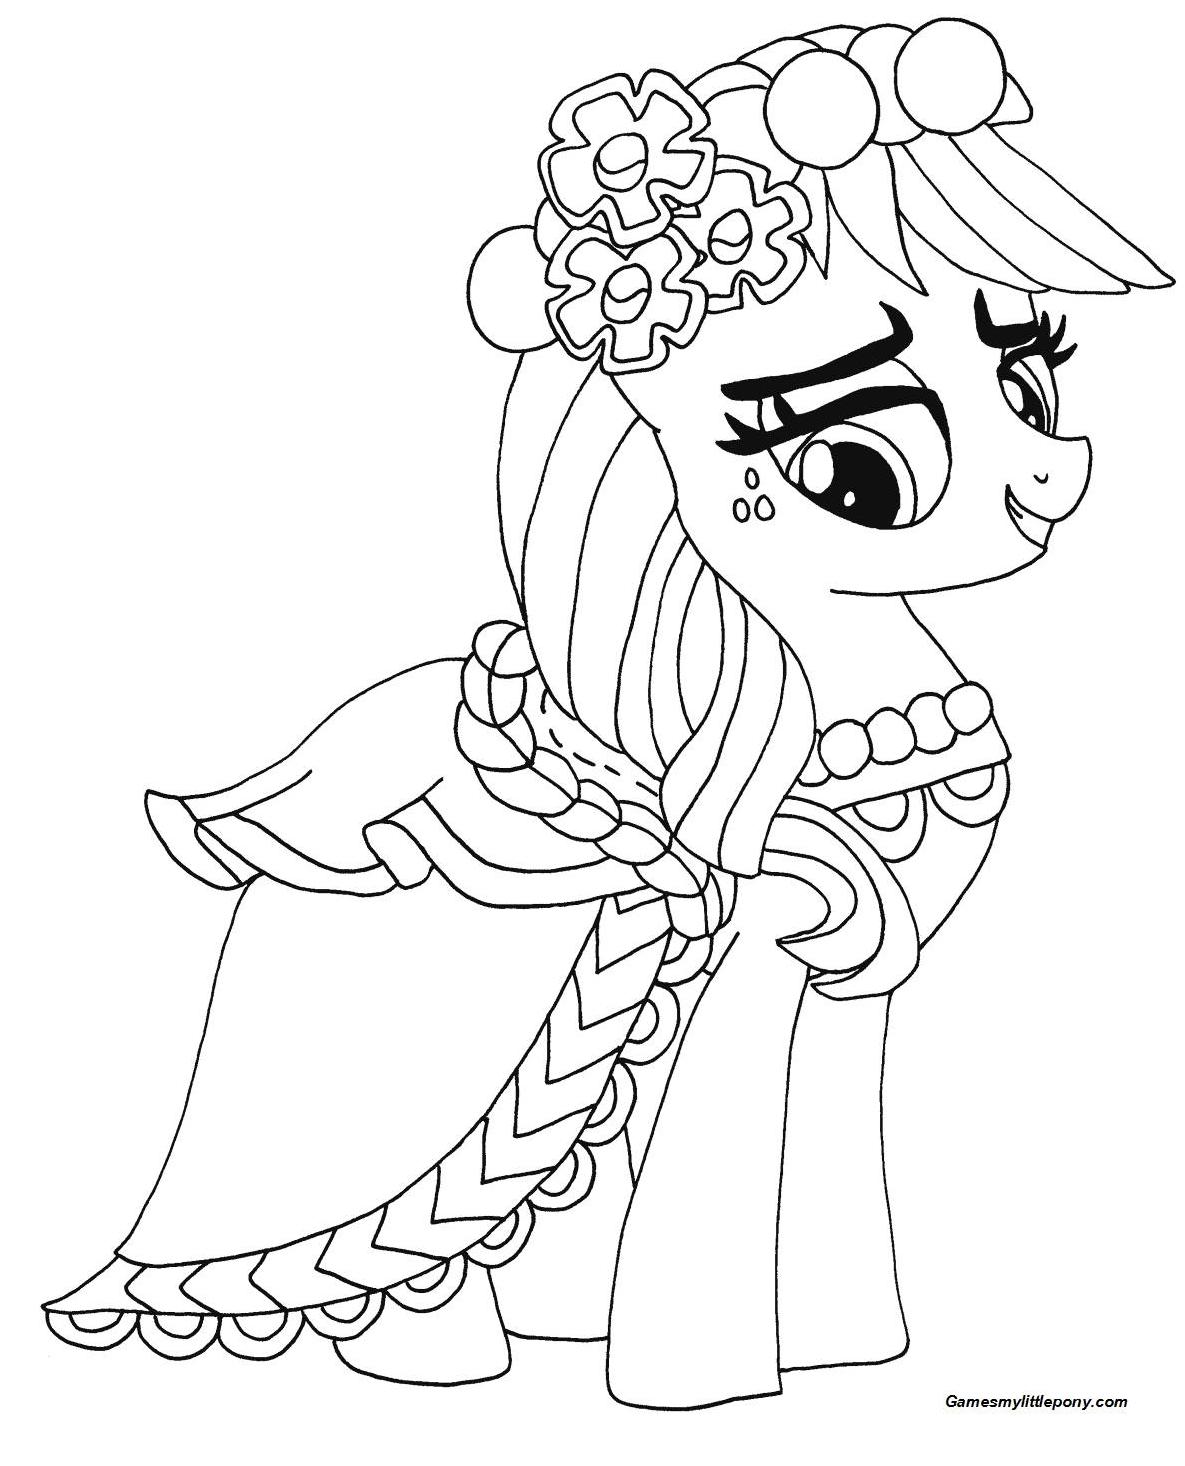 My Little Pony Applejack from My Little Pony